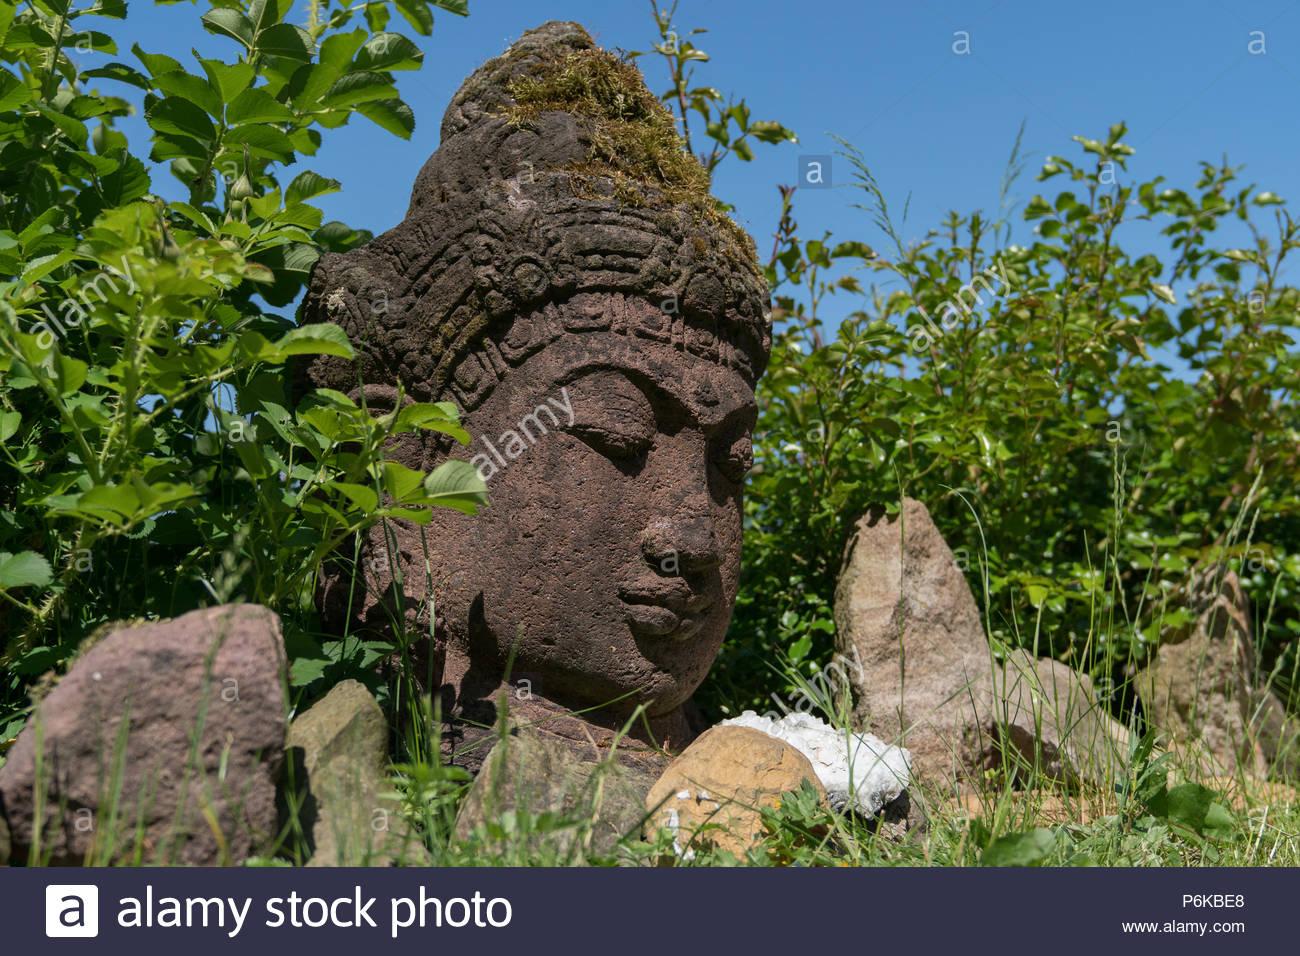 Closeup of an Indian buddhism stone sculpture in a green garden - Stock Image